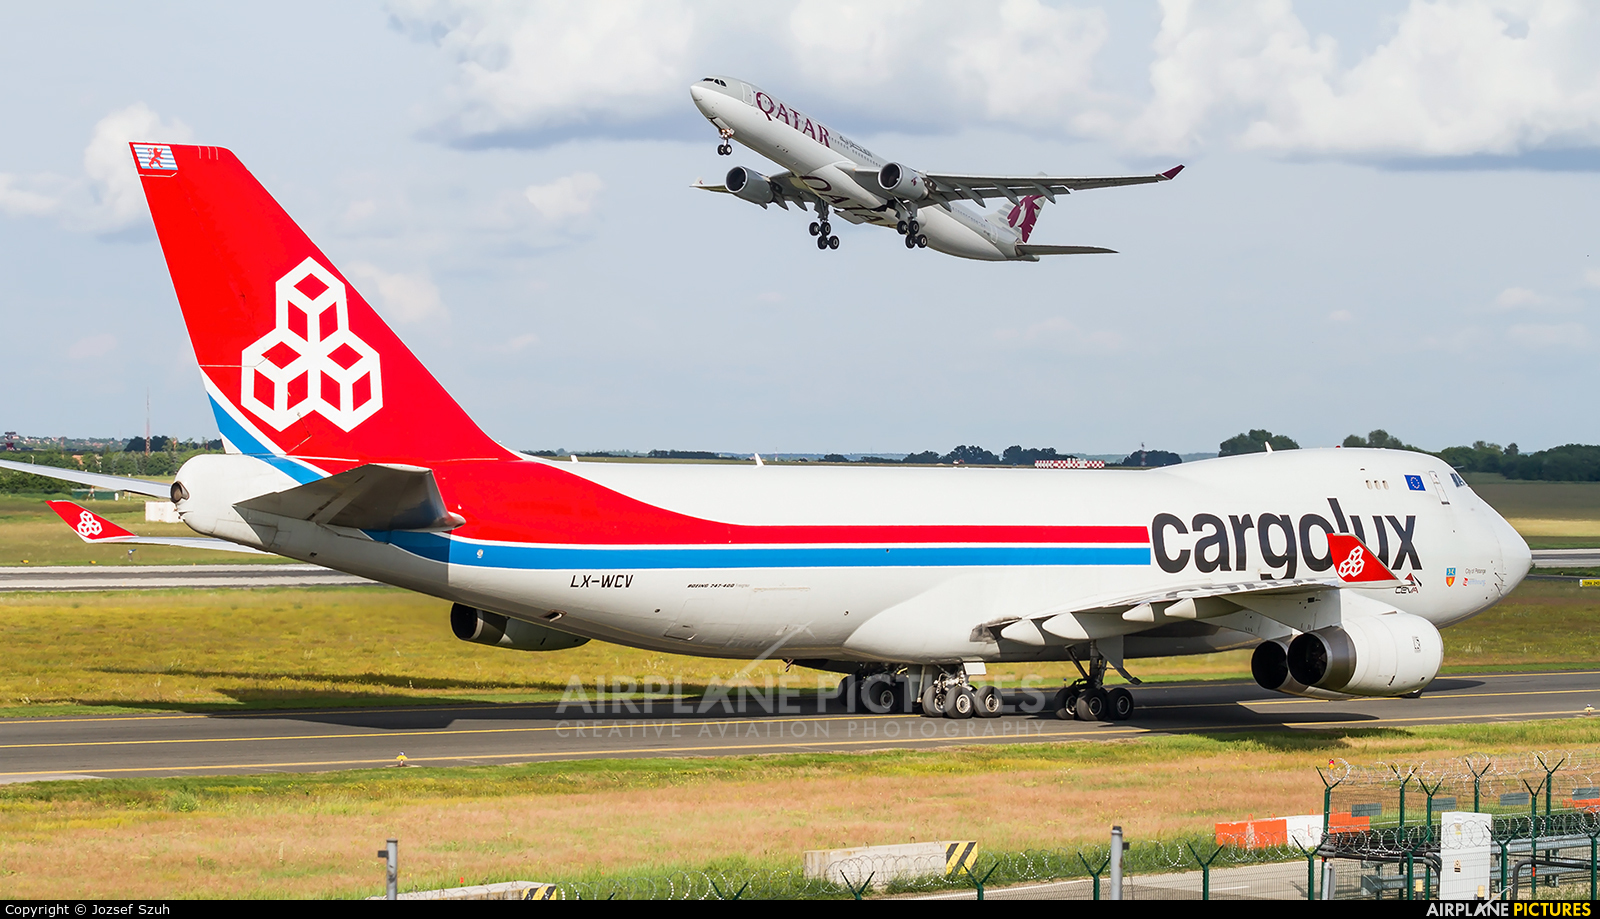 Cargolux LX-WCV aircraft at Budapest Ferenc Liszt International Airport